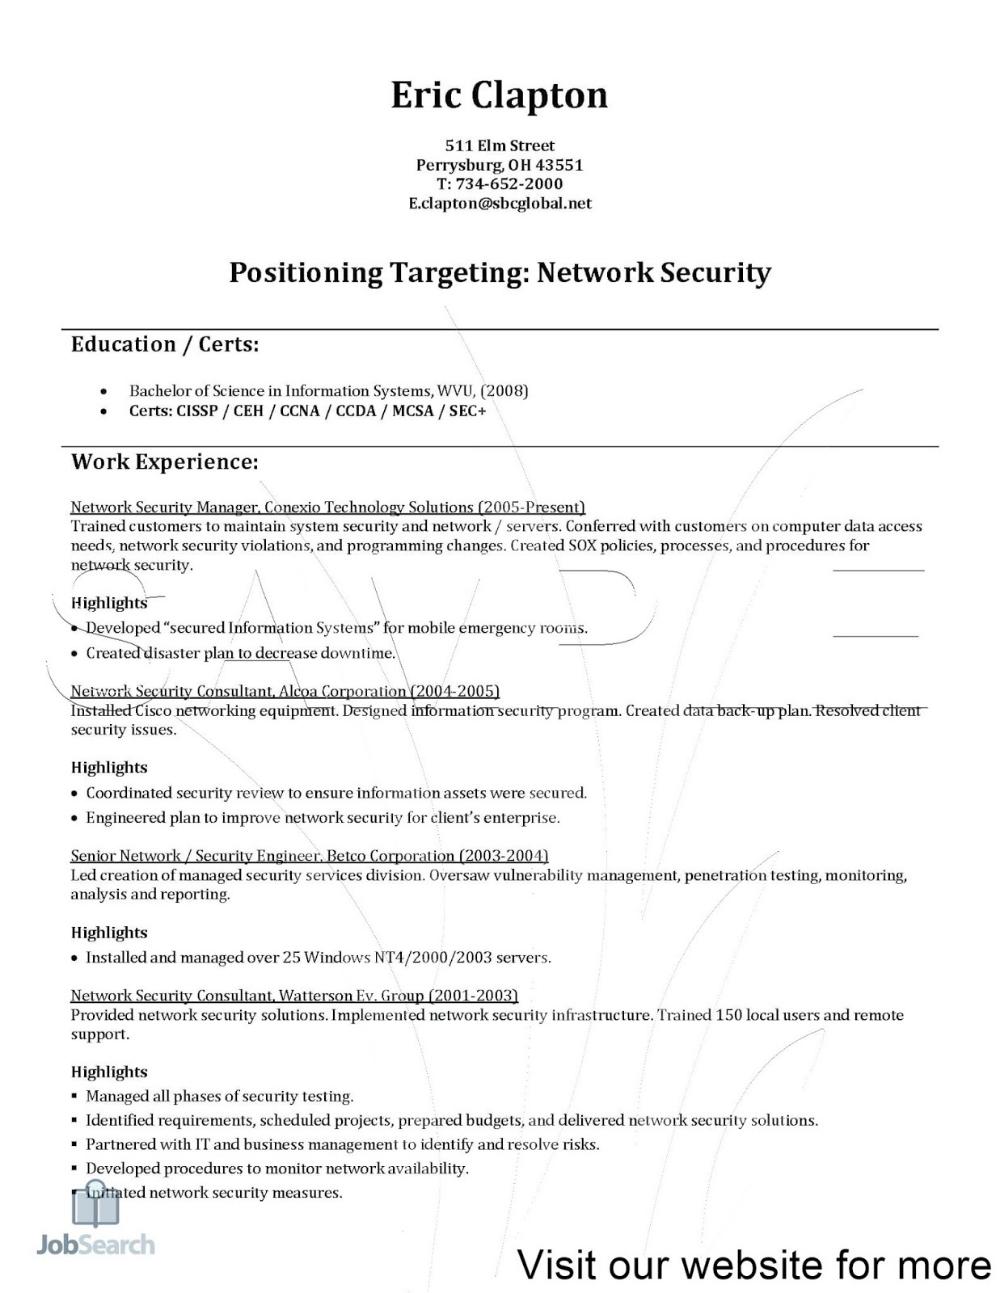 Network Architect Resume Pdf Network Architect Objective Network Architect Resume Network Architec In 2020 Resume Design Template Resume Template Free Resume Template